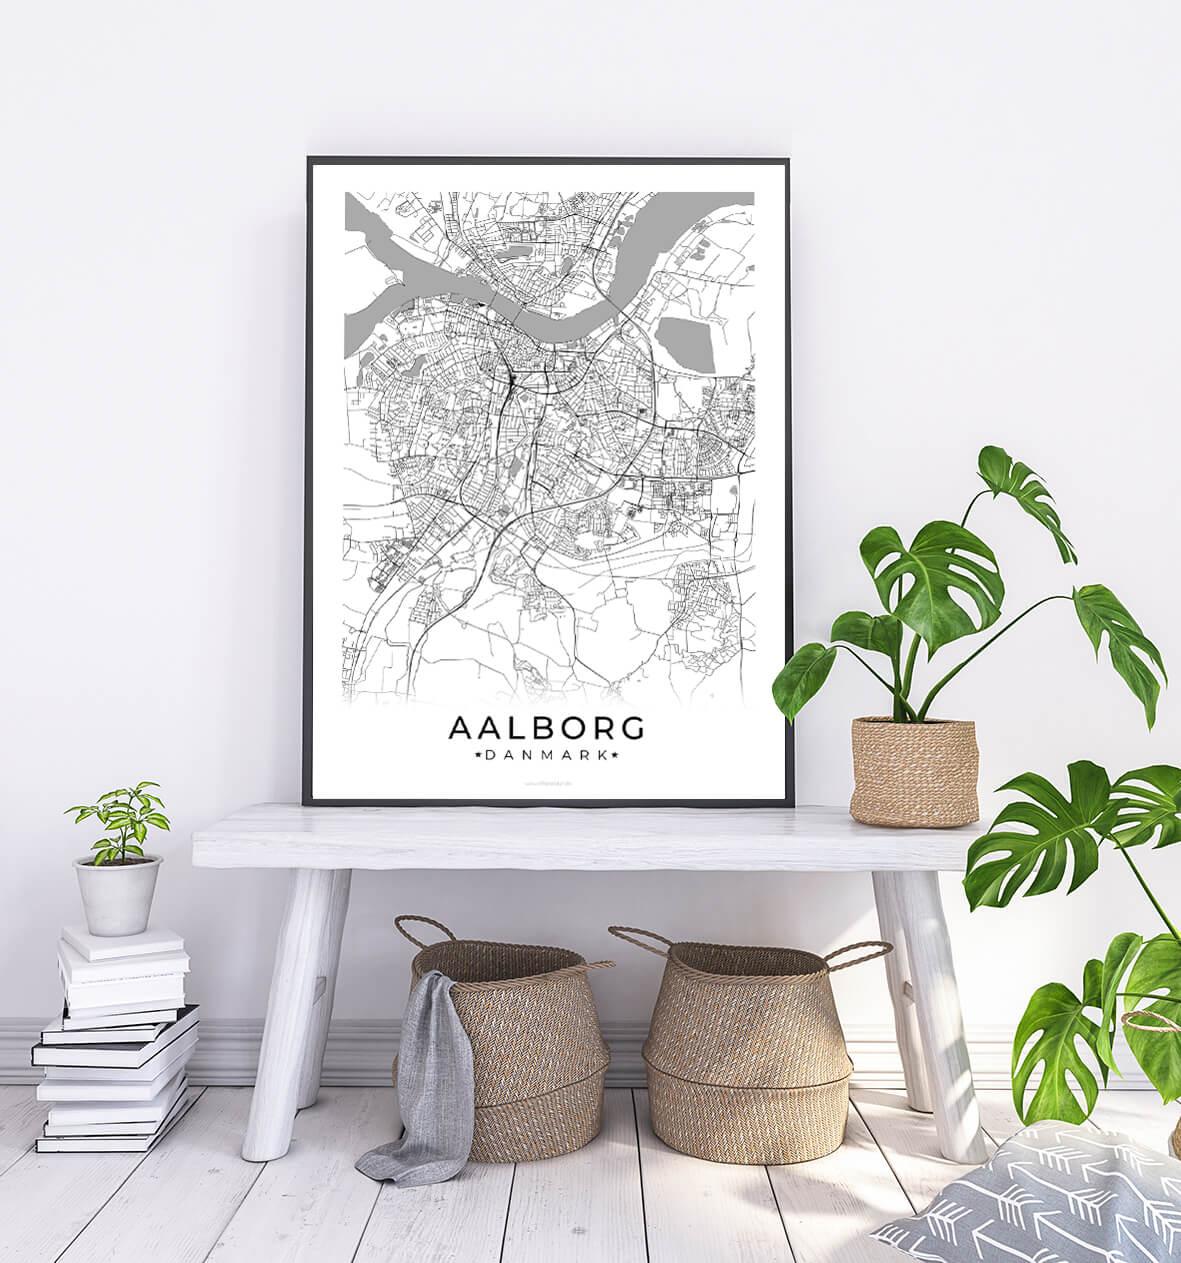 Aalborg-hvid-byplakat-1